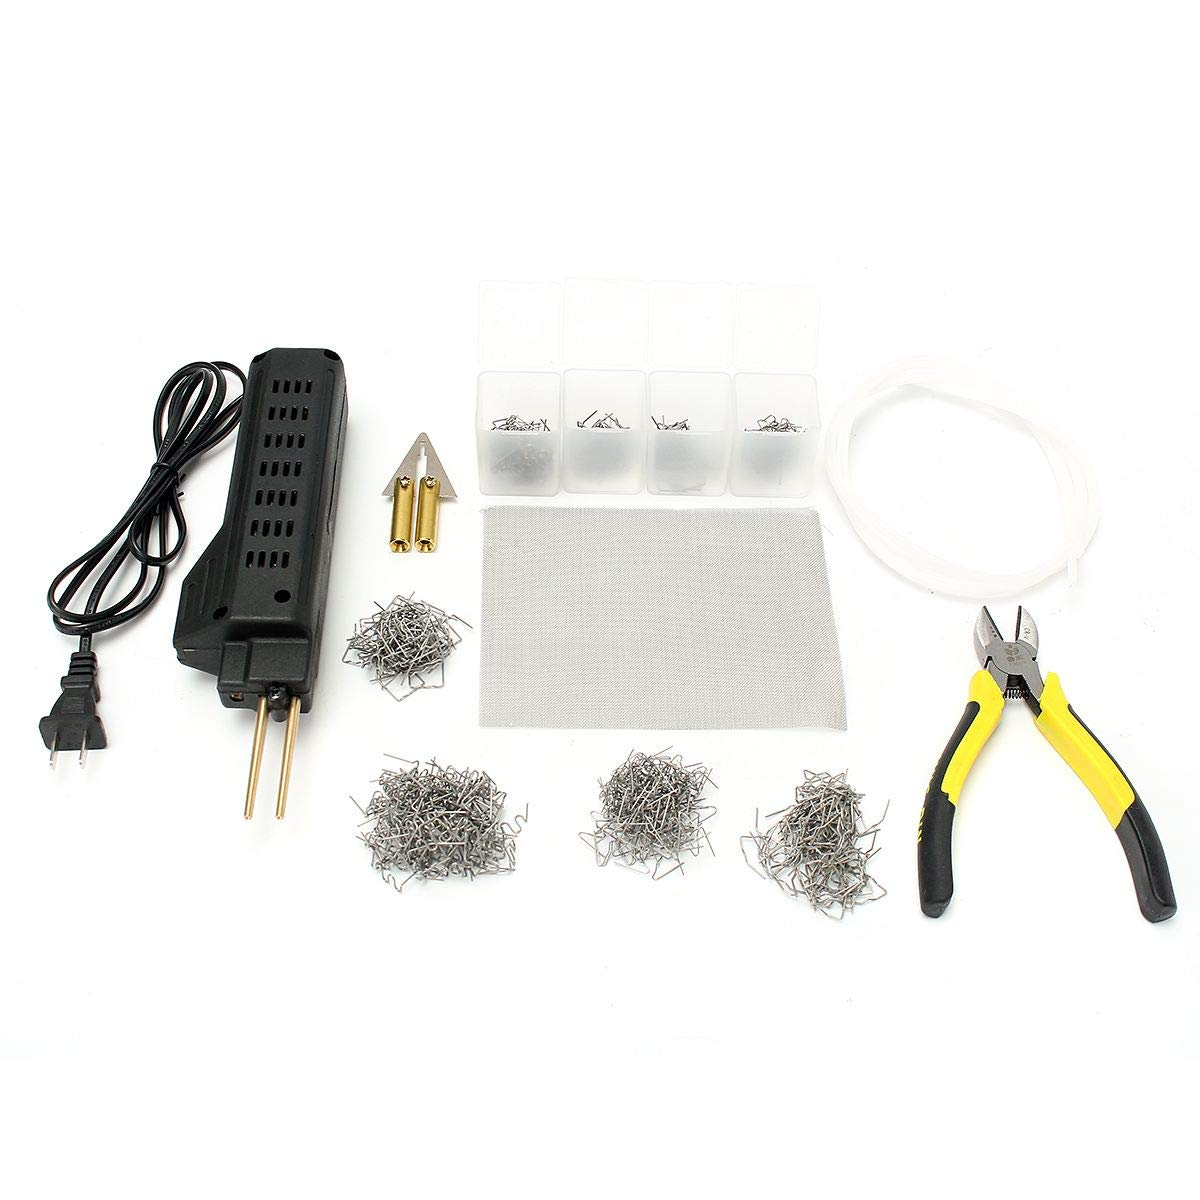 Kit Hot Stapler with 400 Staples Car Bumper Plastic Welding Torch Fairing Auto Body Tool Welder Machine for Plastic Repair Bumper Repair SKU: 48-9FFA-1D9D